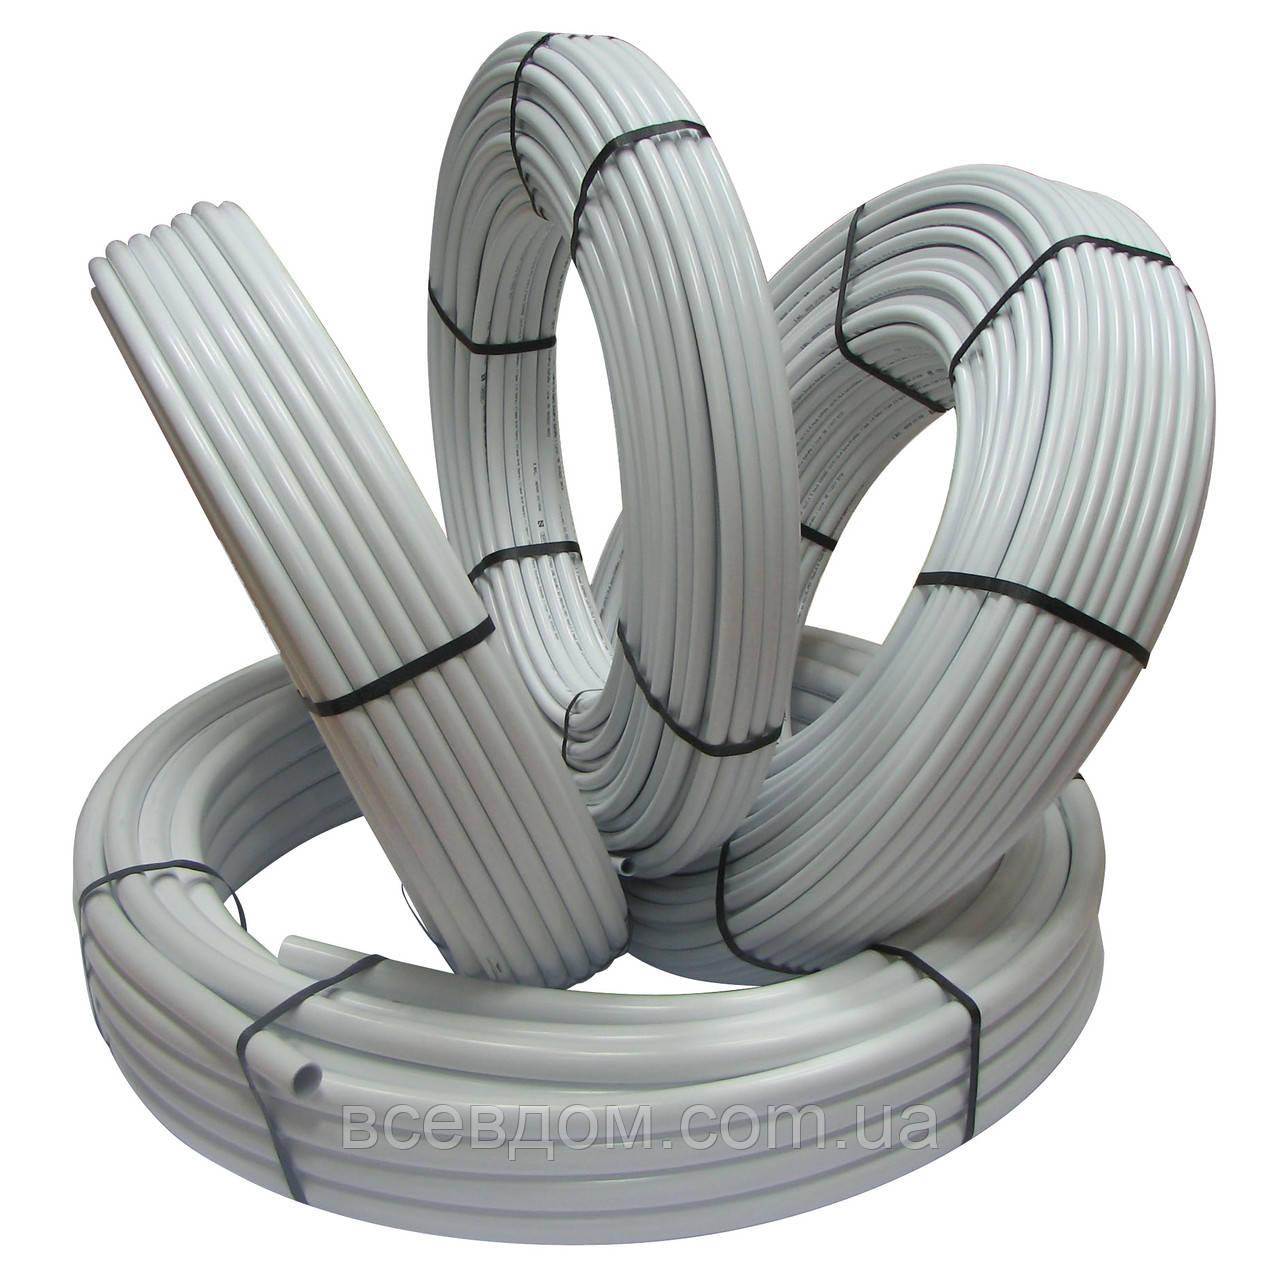 Труба металлопластиковая бесшовная PEXAL 16х2